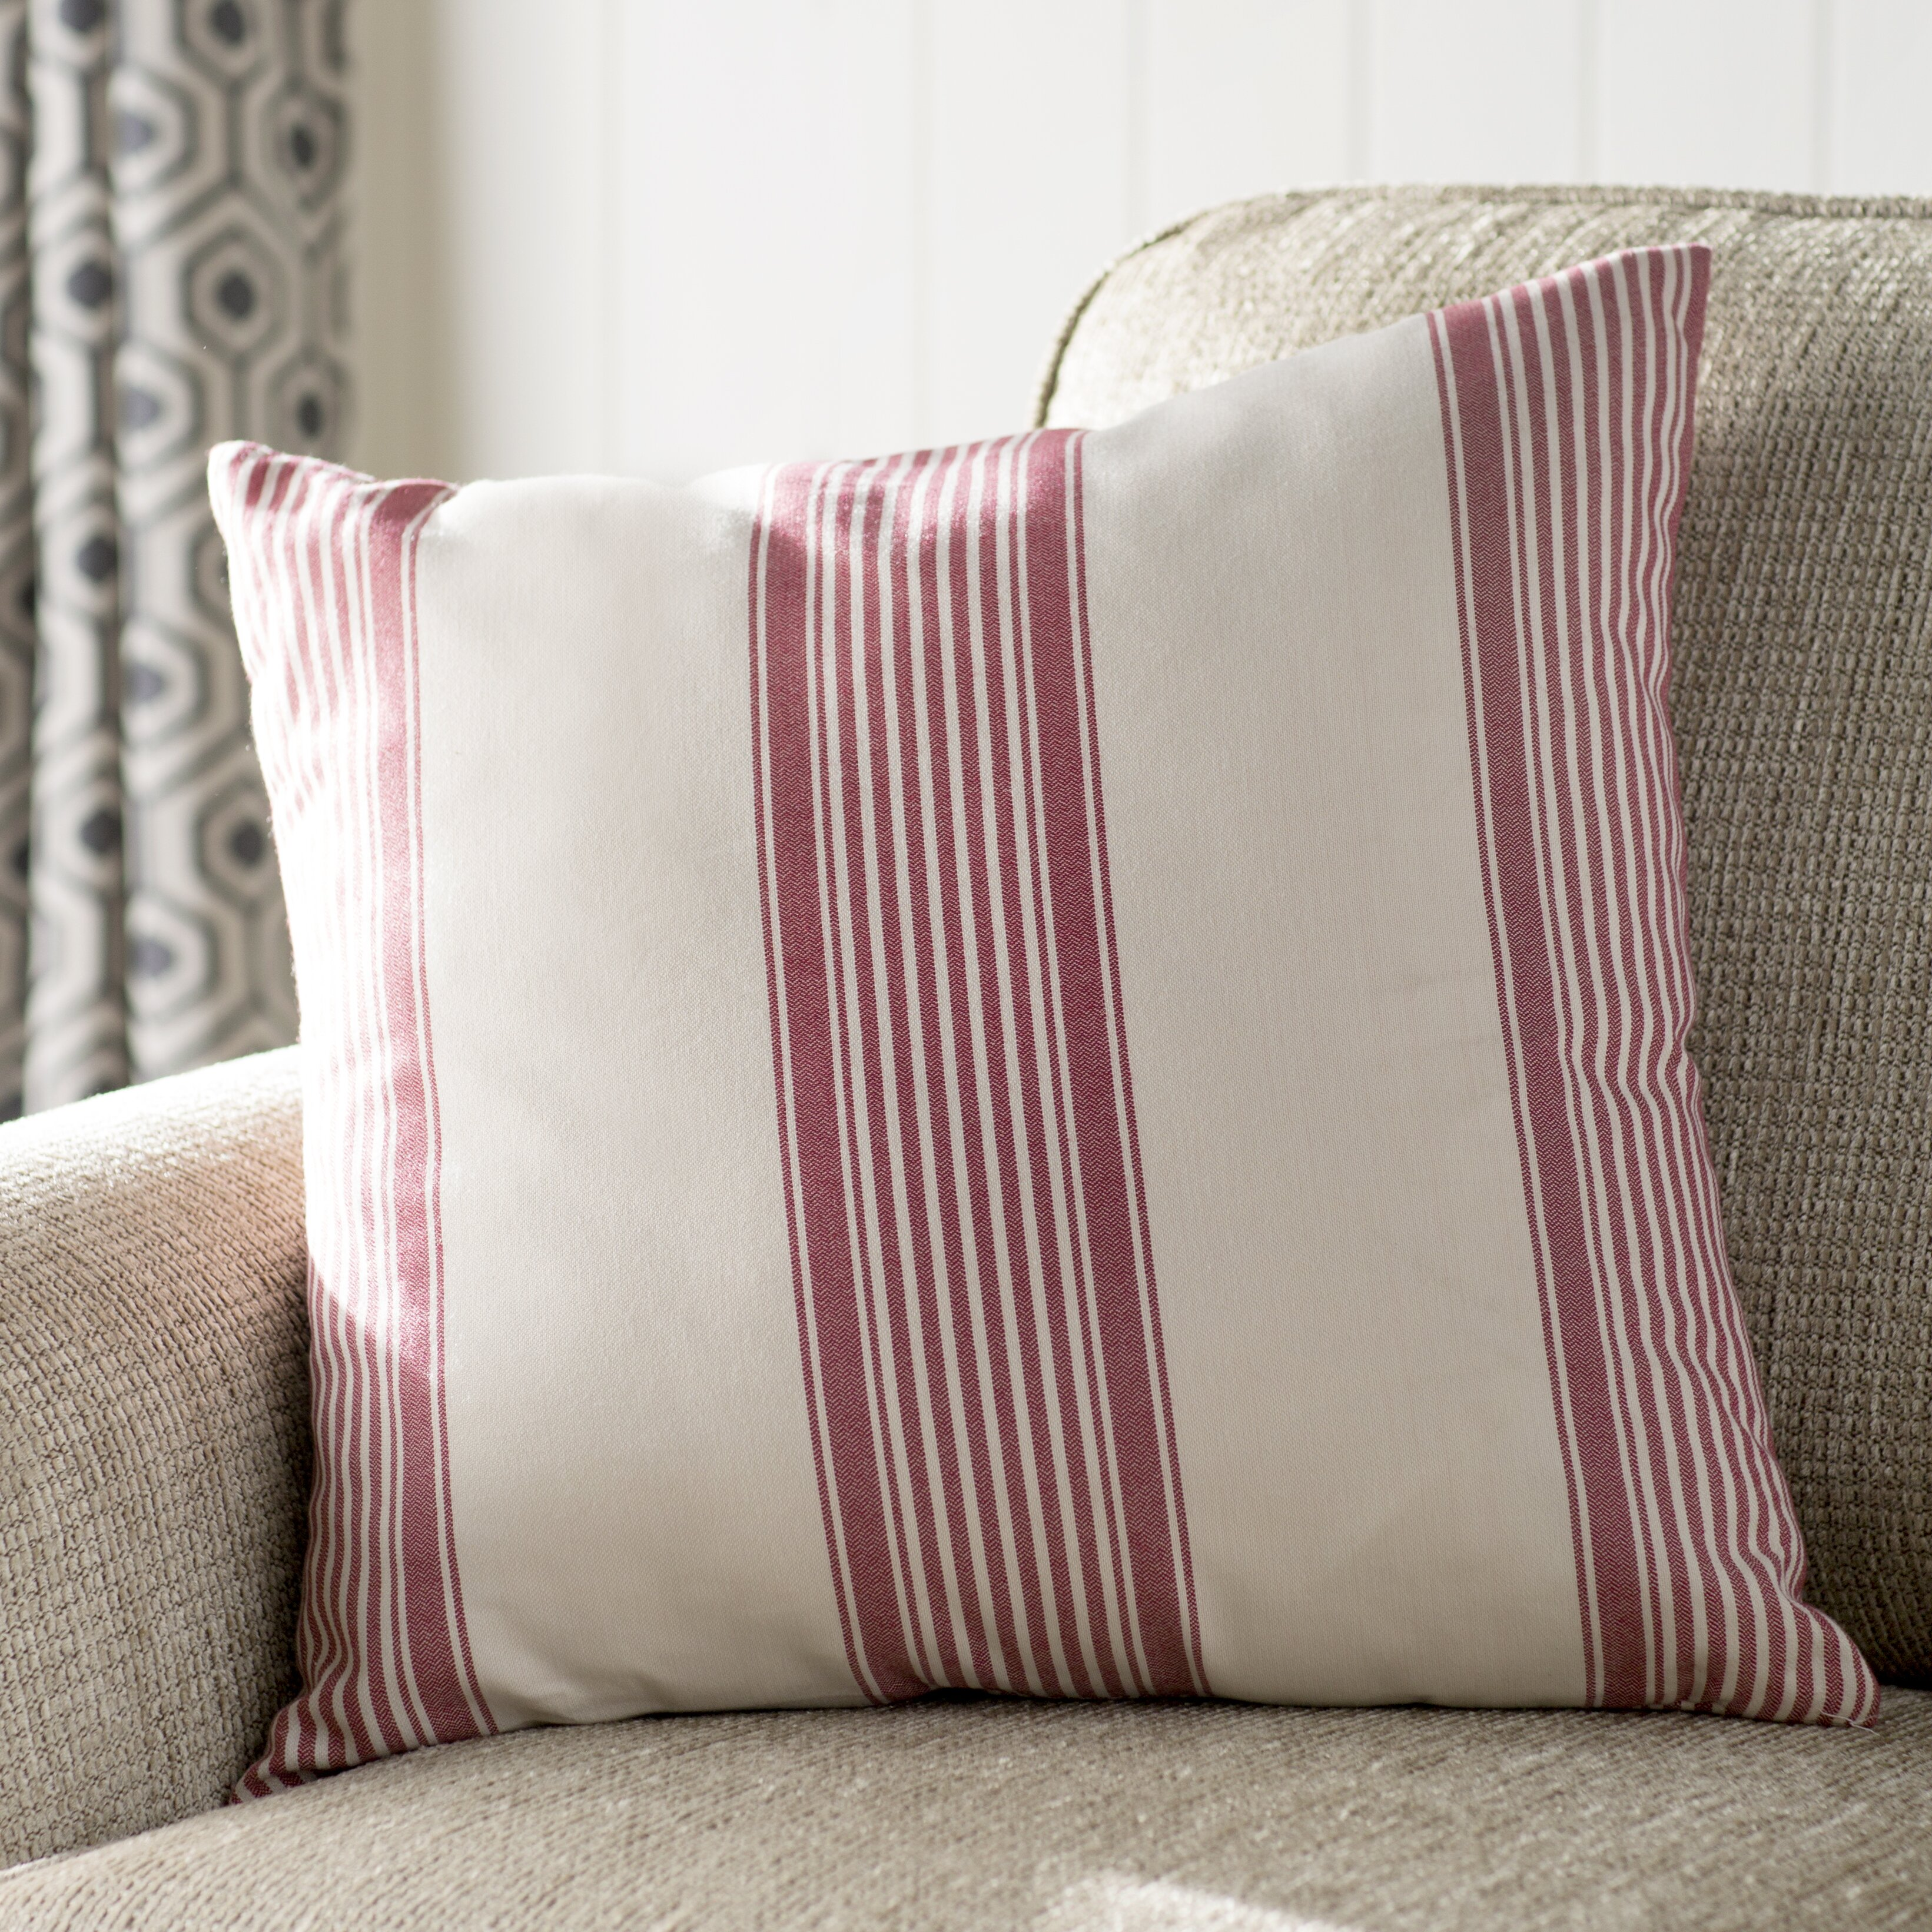 Newport Decorative Pillows Set Of 2 : Three Posts Newport Throw Pillow & Reviews Wayfair.ca